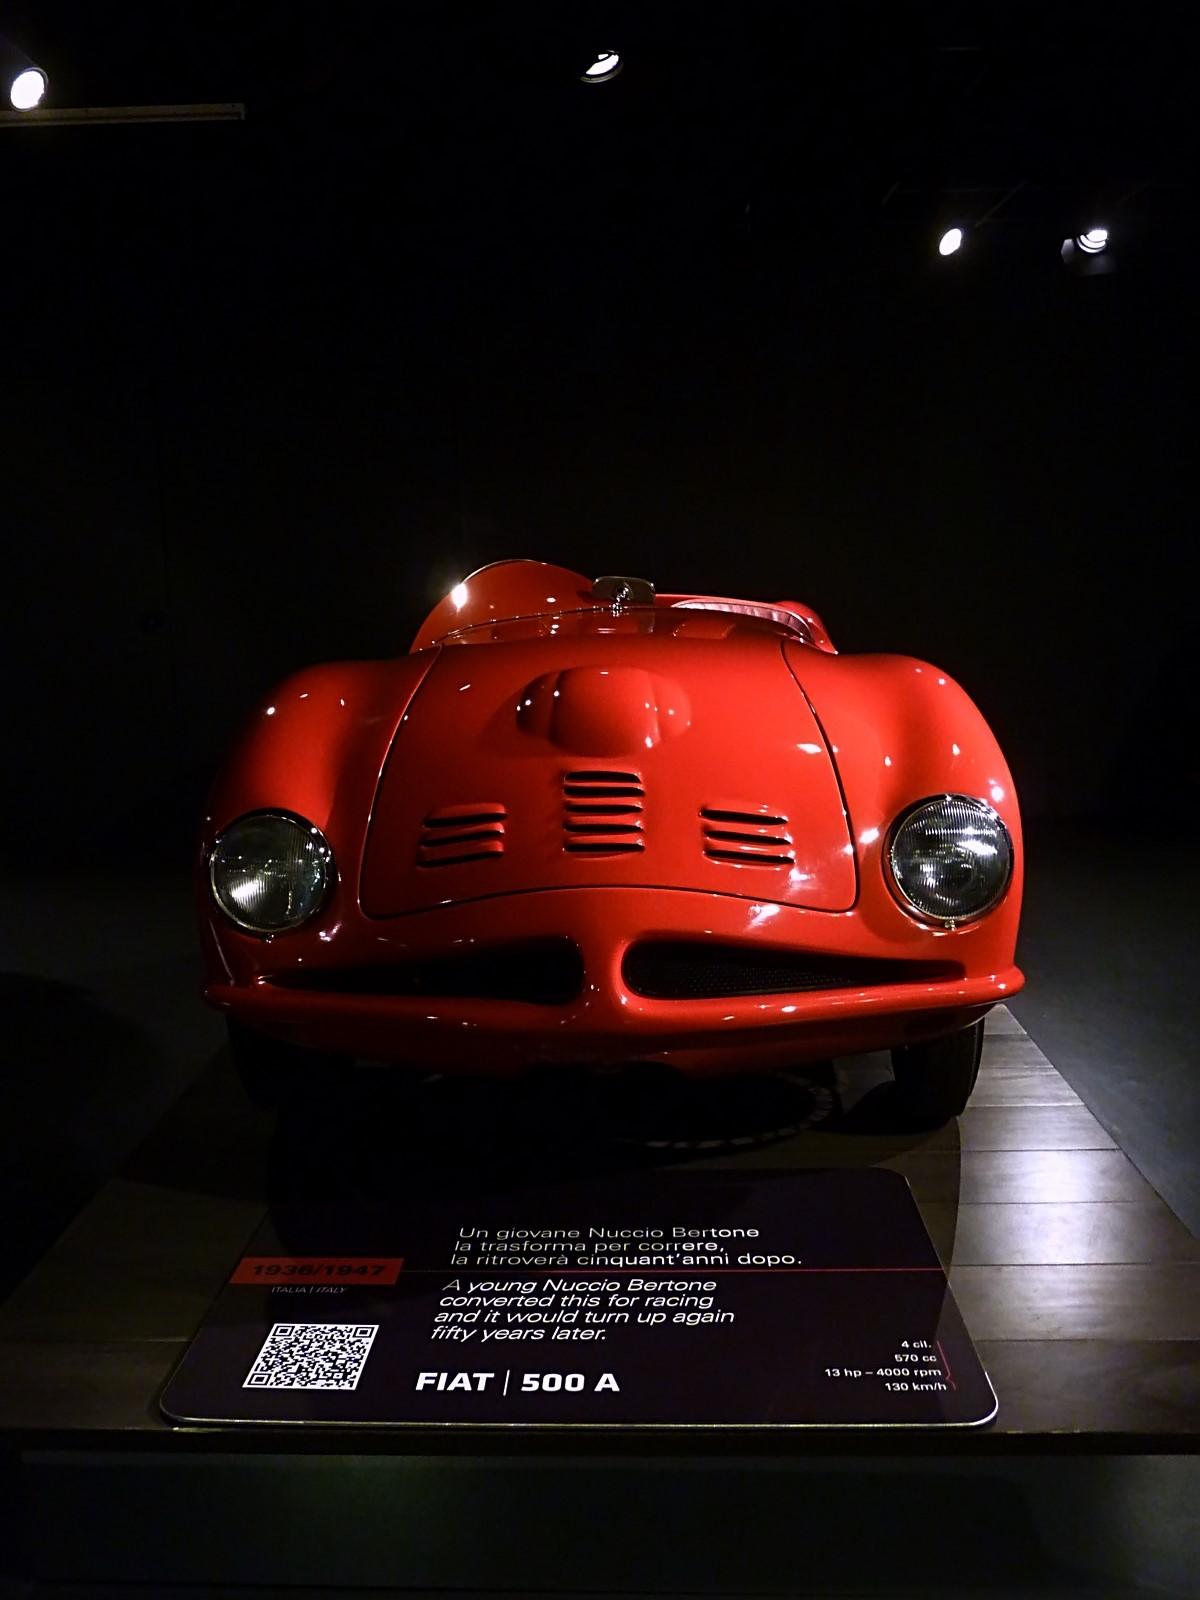 1936-47 FIAT 500A Barchetta by Bertone (1).jpg